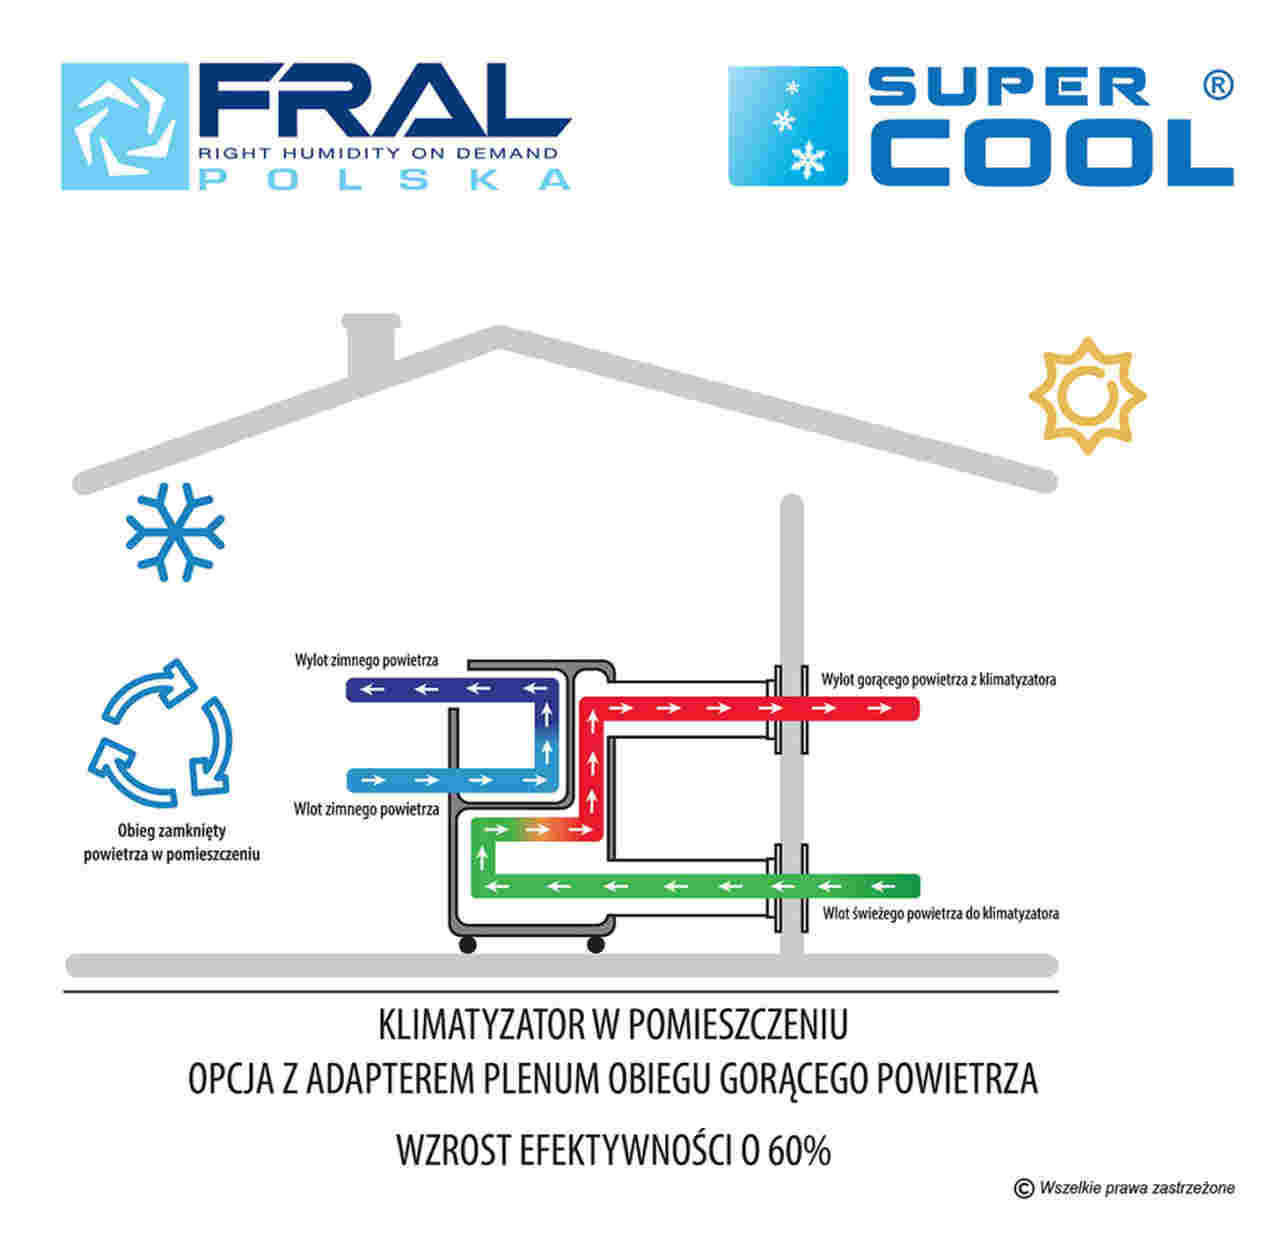 Klimatyzator Fral FSC12H instalacja